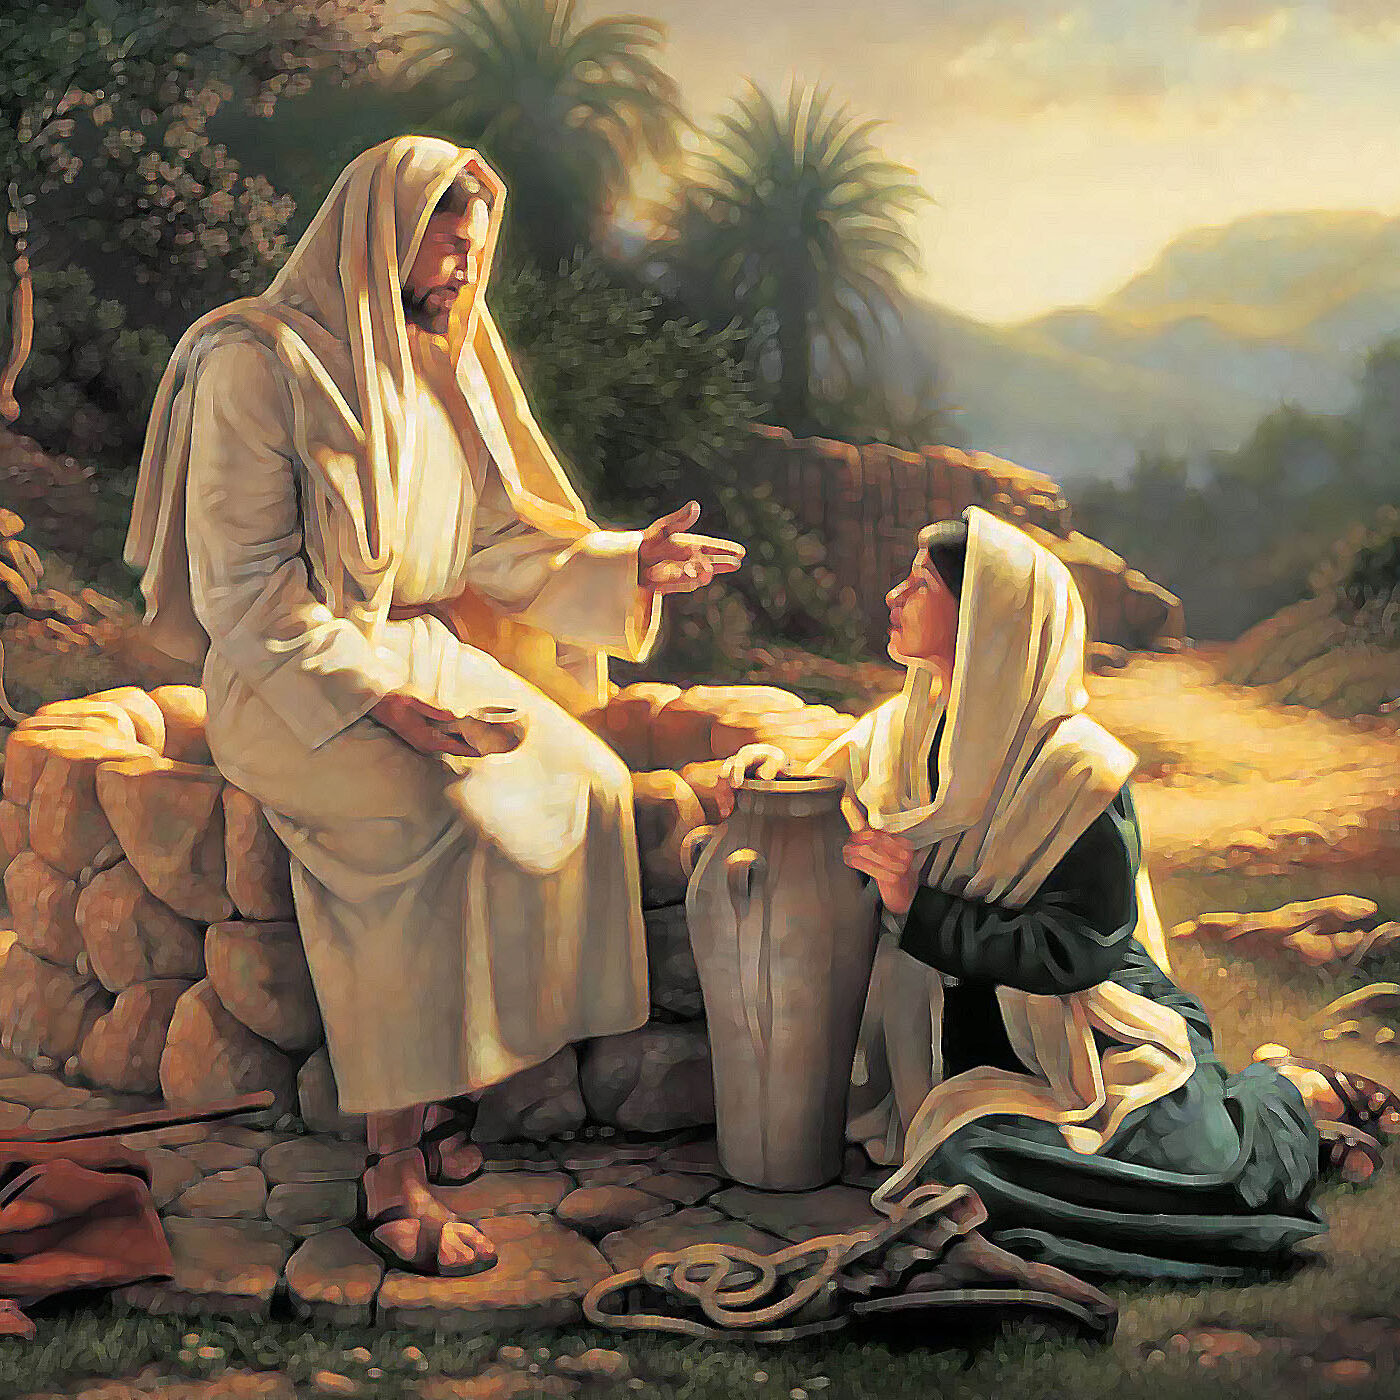 riflessioni sul Vangelo di Venerdì 8 Ottobre 2021 (Lc 11, 15-26)